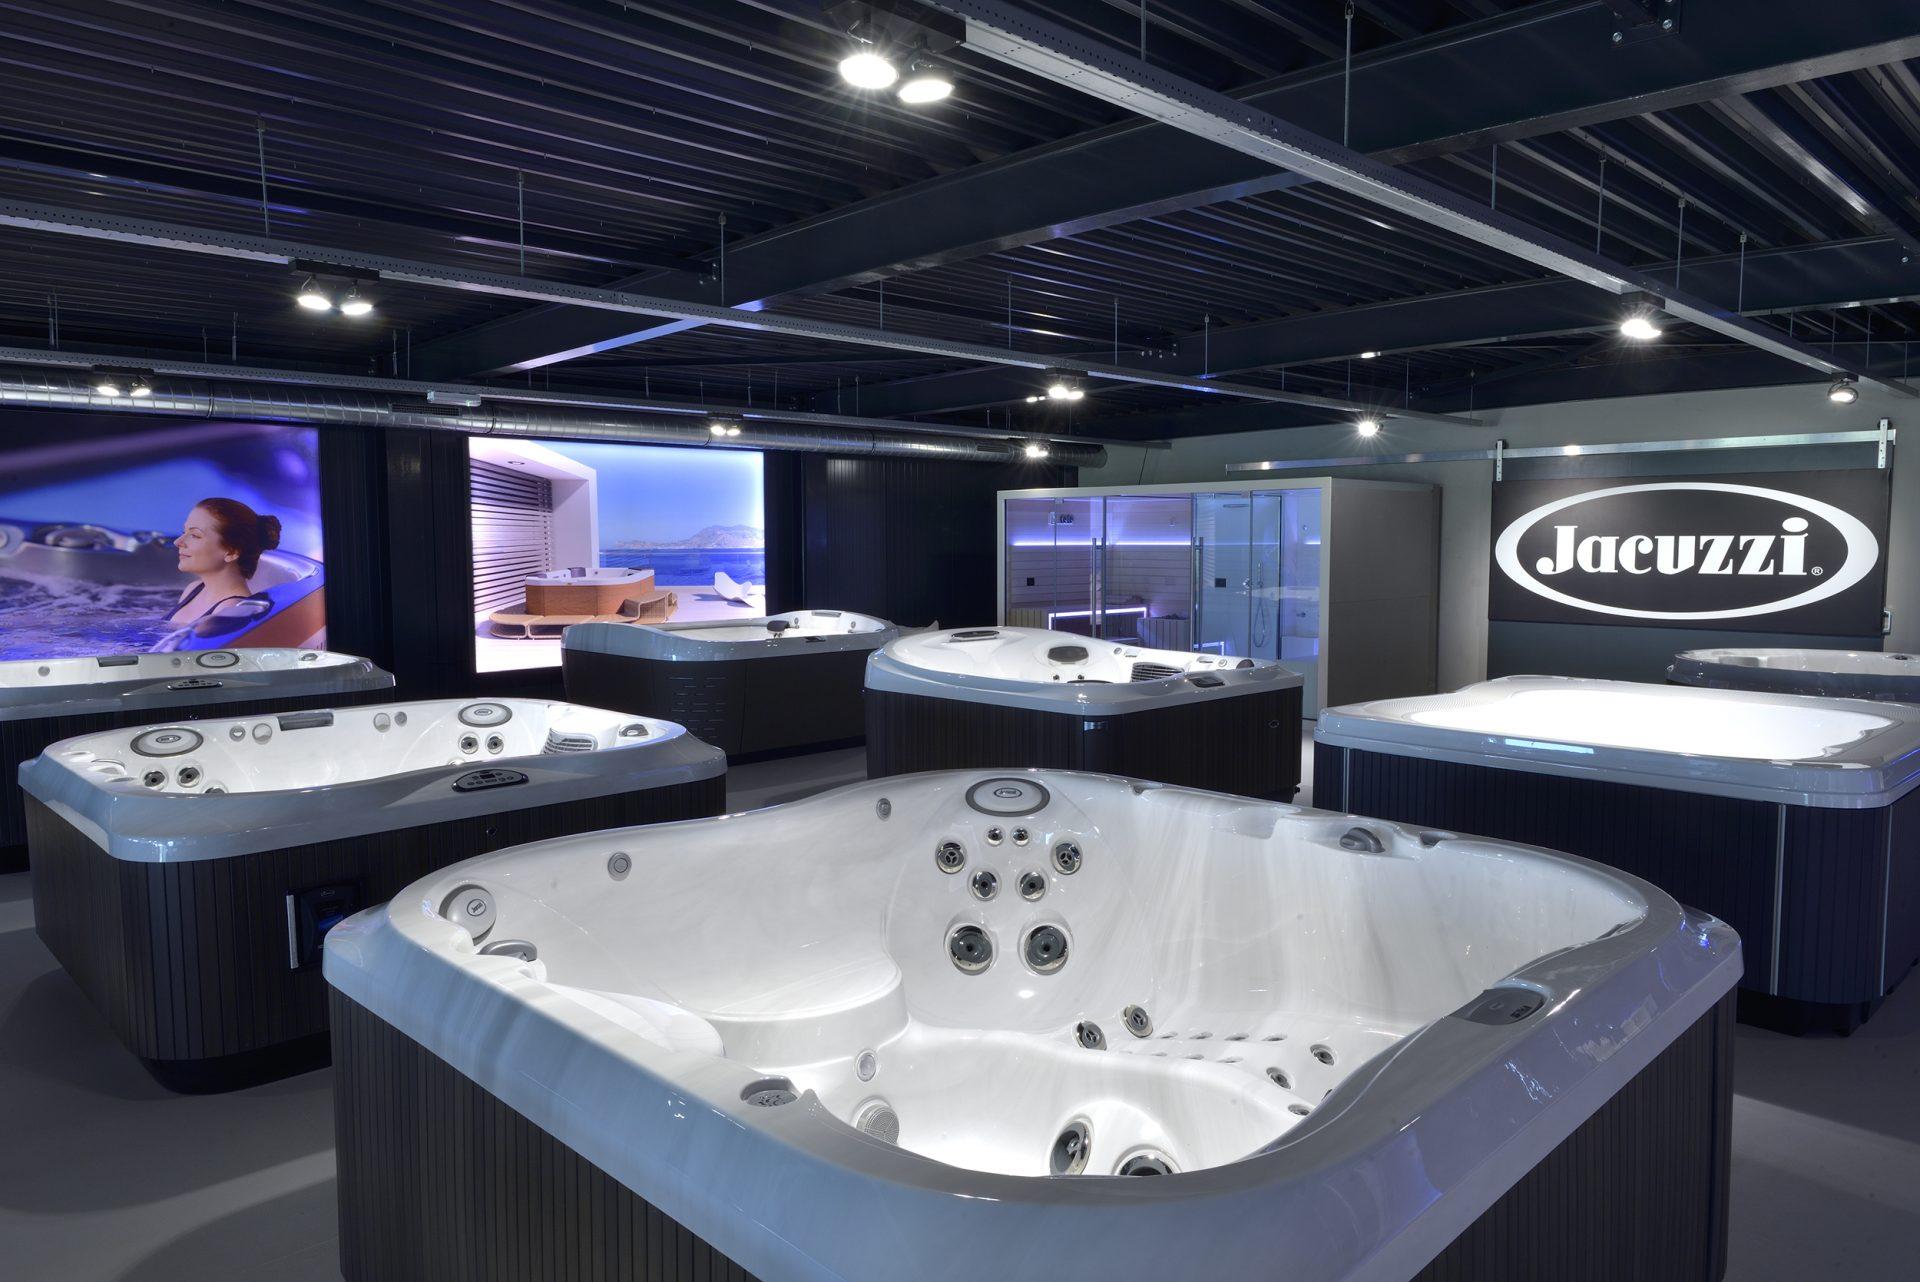 Jacuzzi® spa showroom